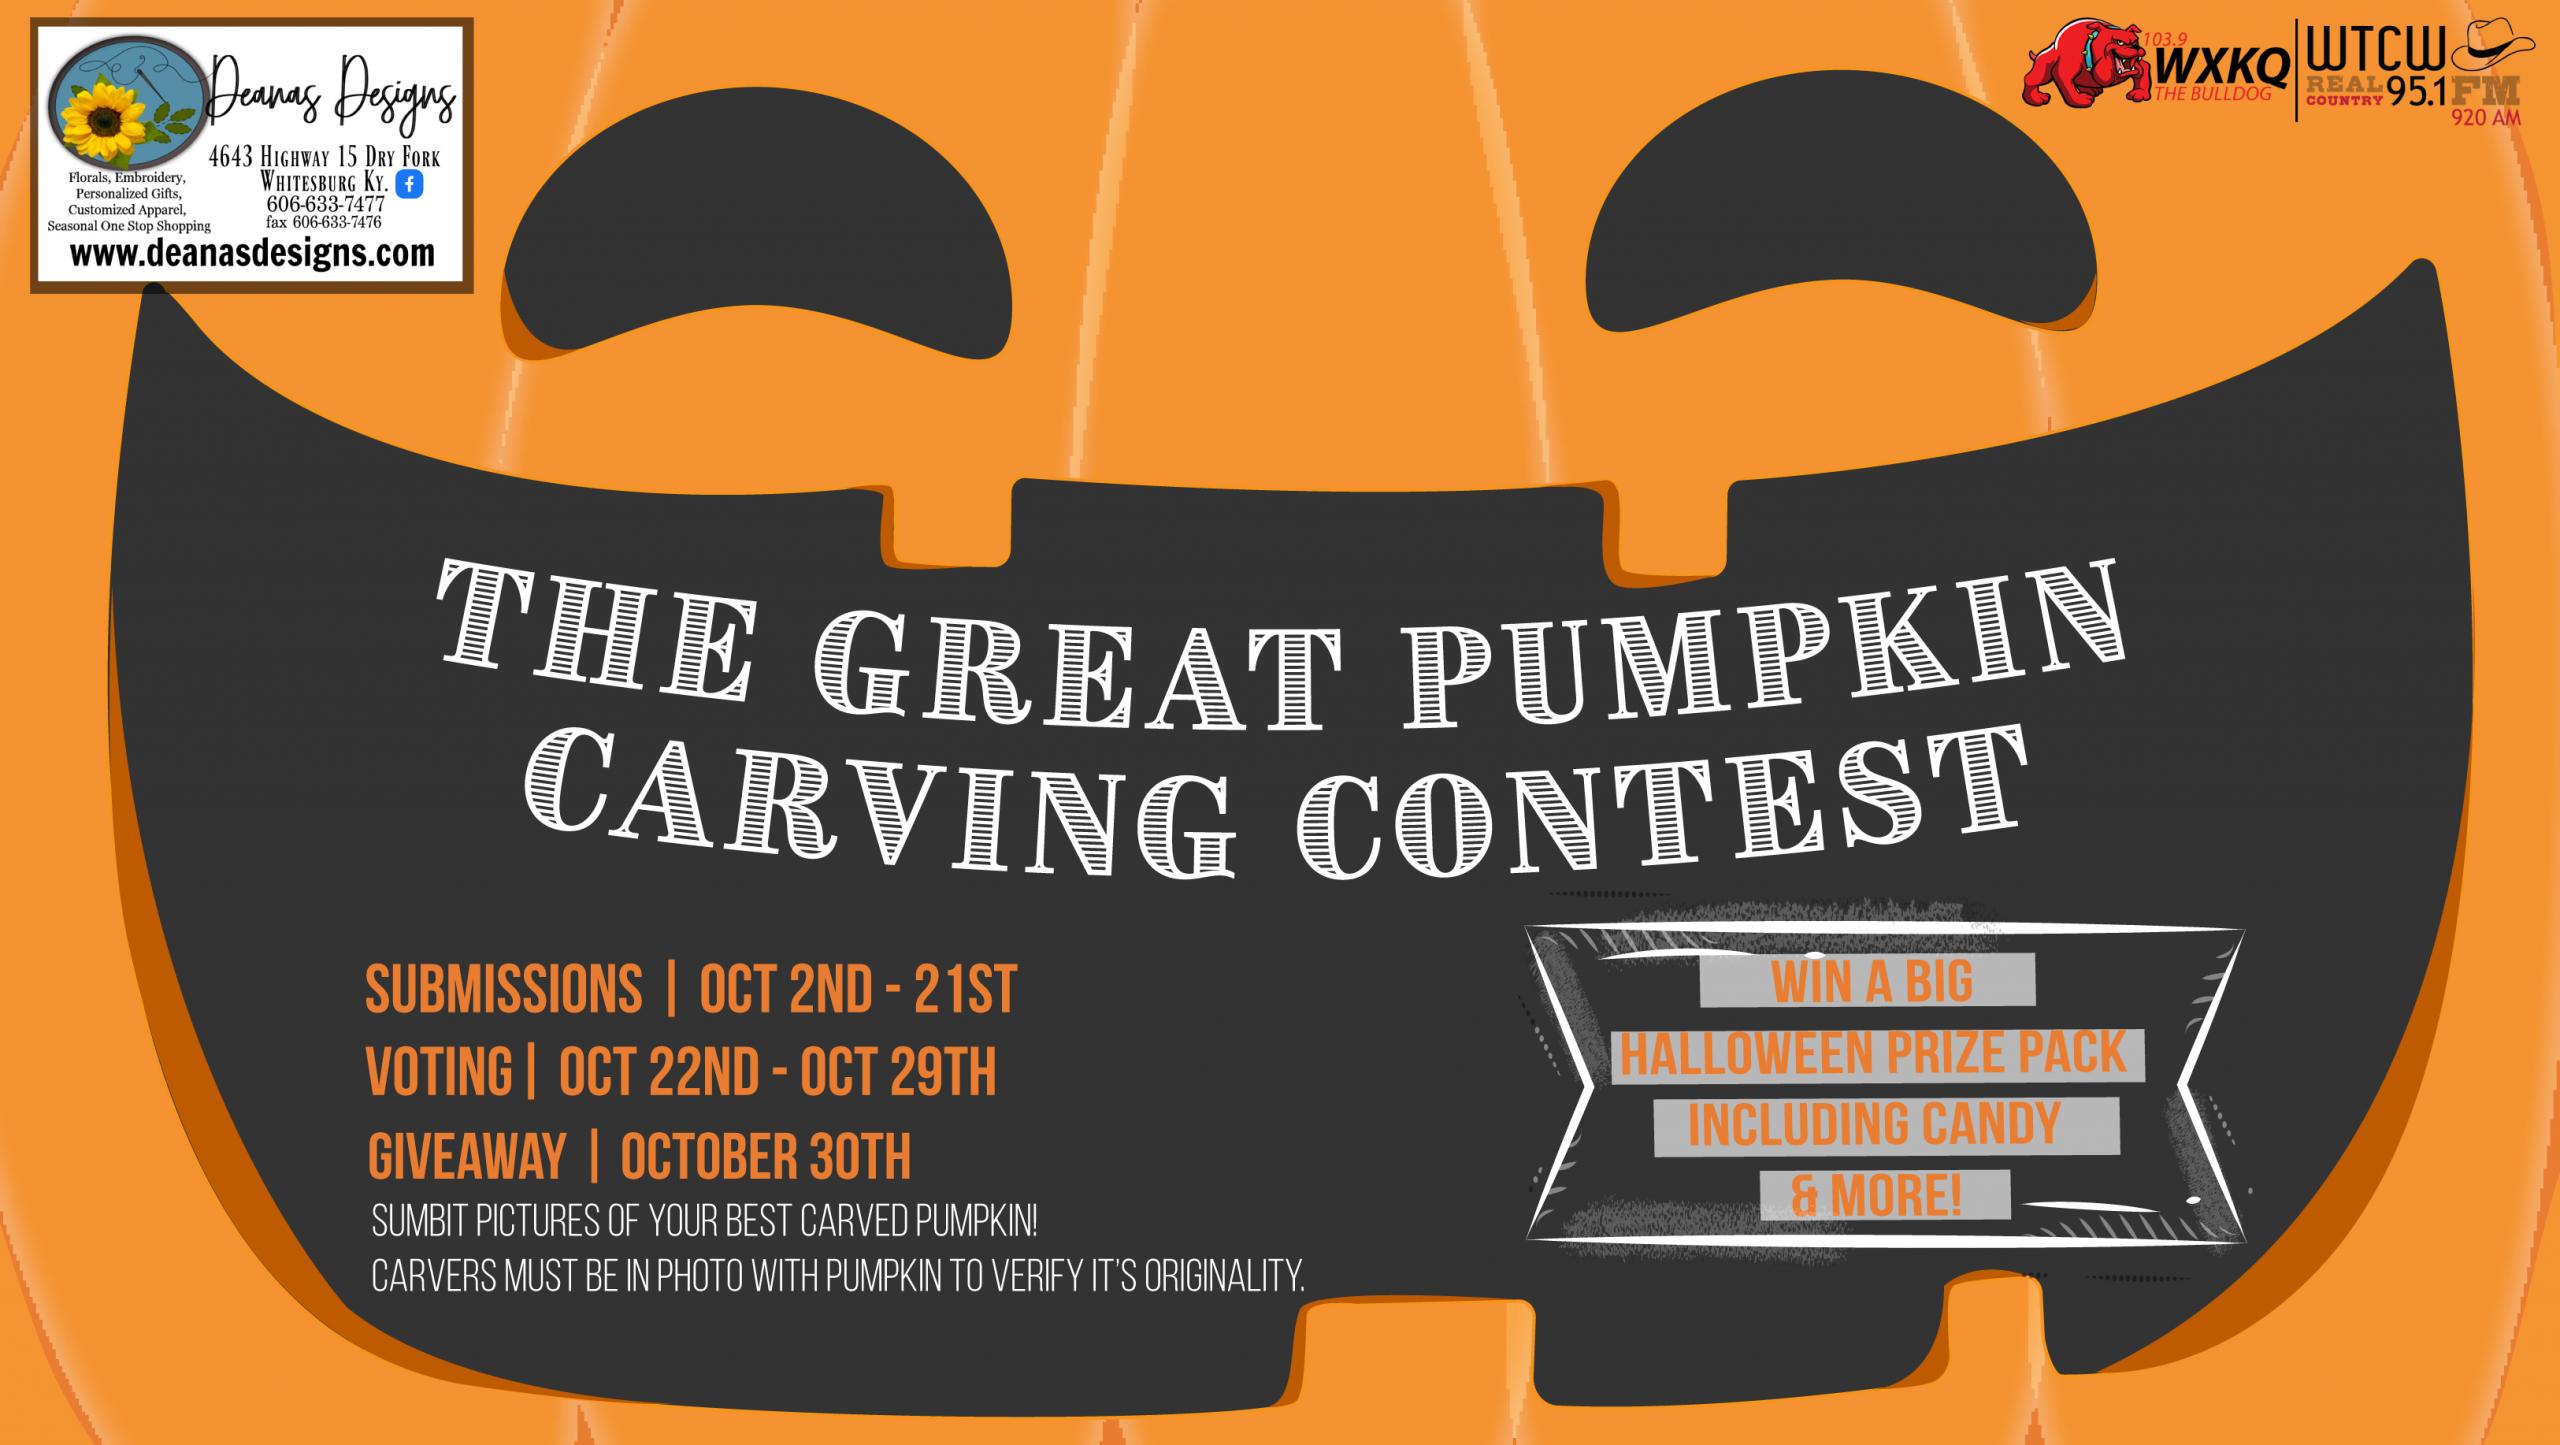 2020 Halloween Whitesburg Ky 103.9 FM The Bulldog WXKQ | Lite Rock